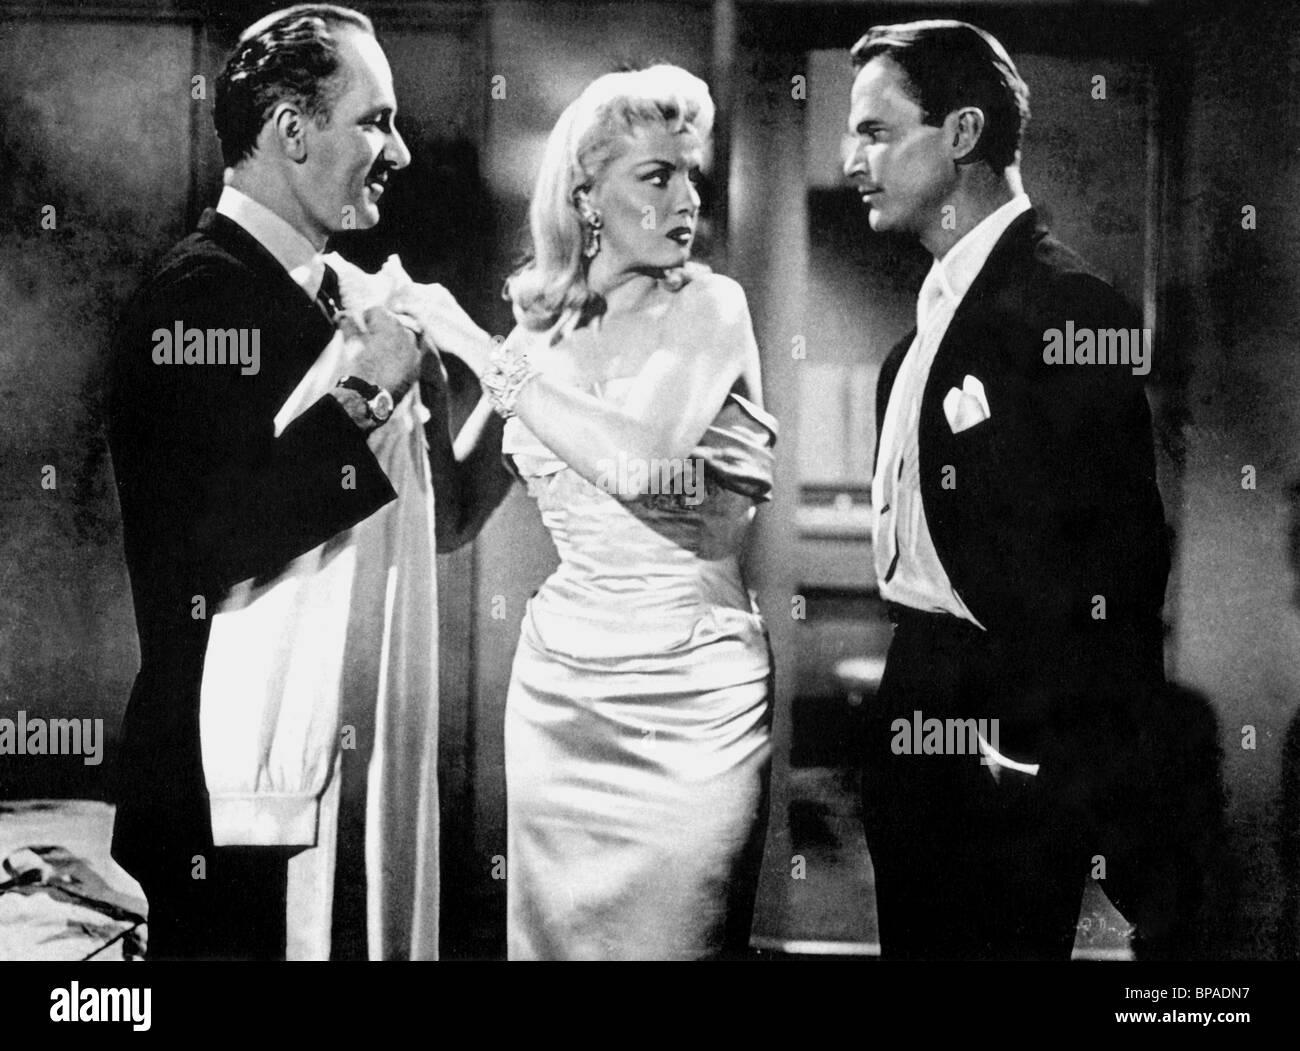 7ce2cd0c87 KEENAN WYNN JANE RUSSELL   RALPH MEEKER THE FUZZY PINK NIGHTGOWN (1957) -  Stock